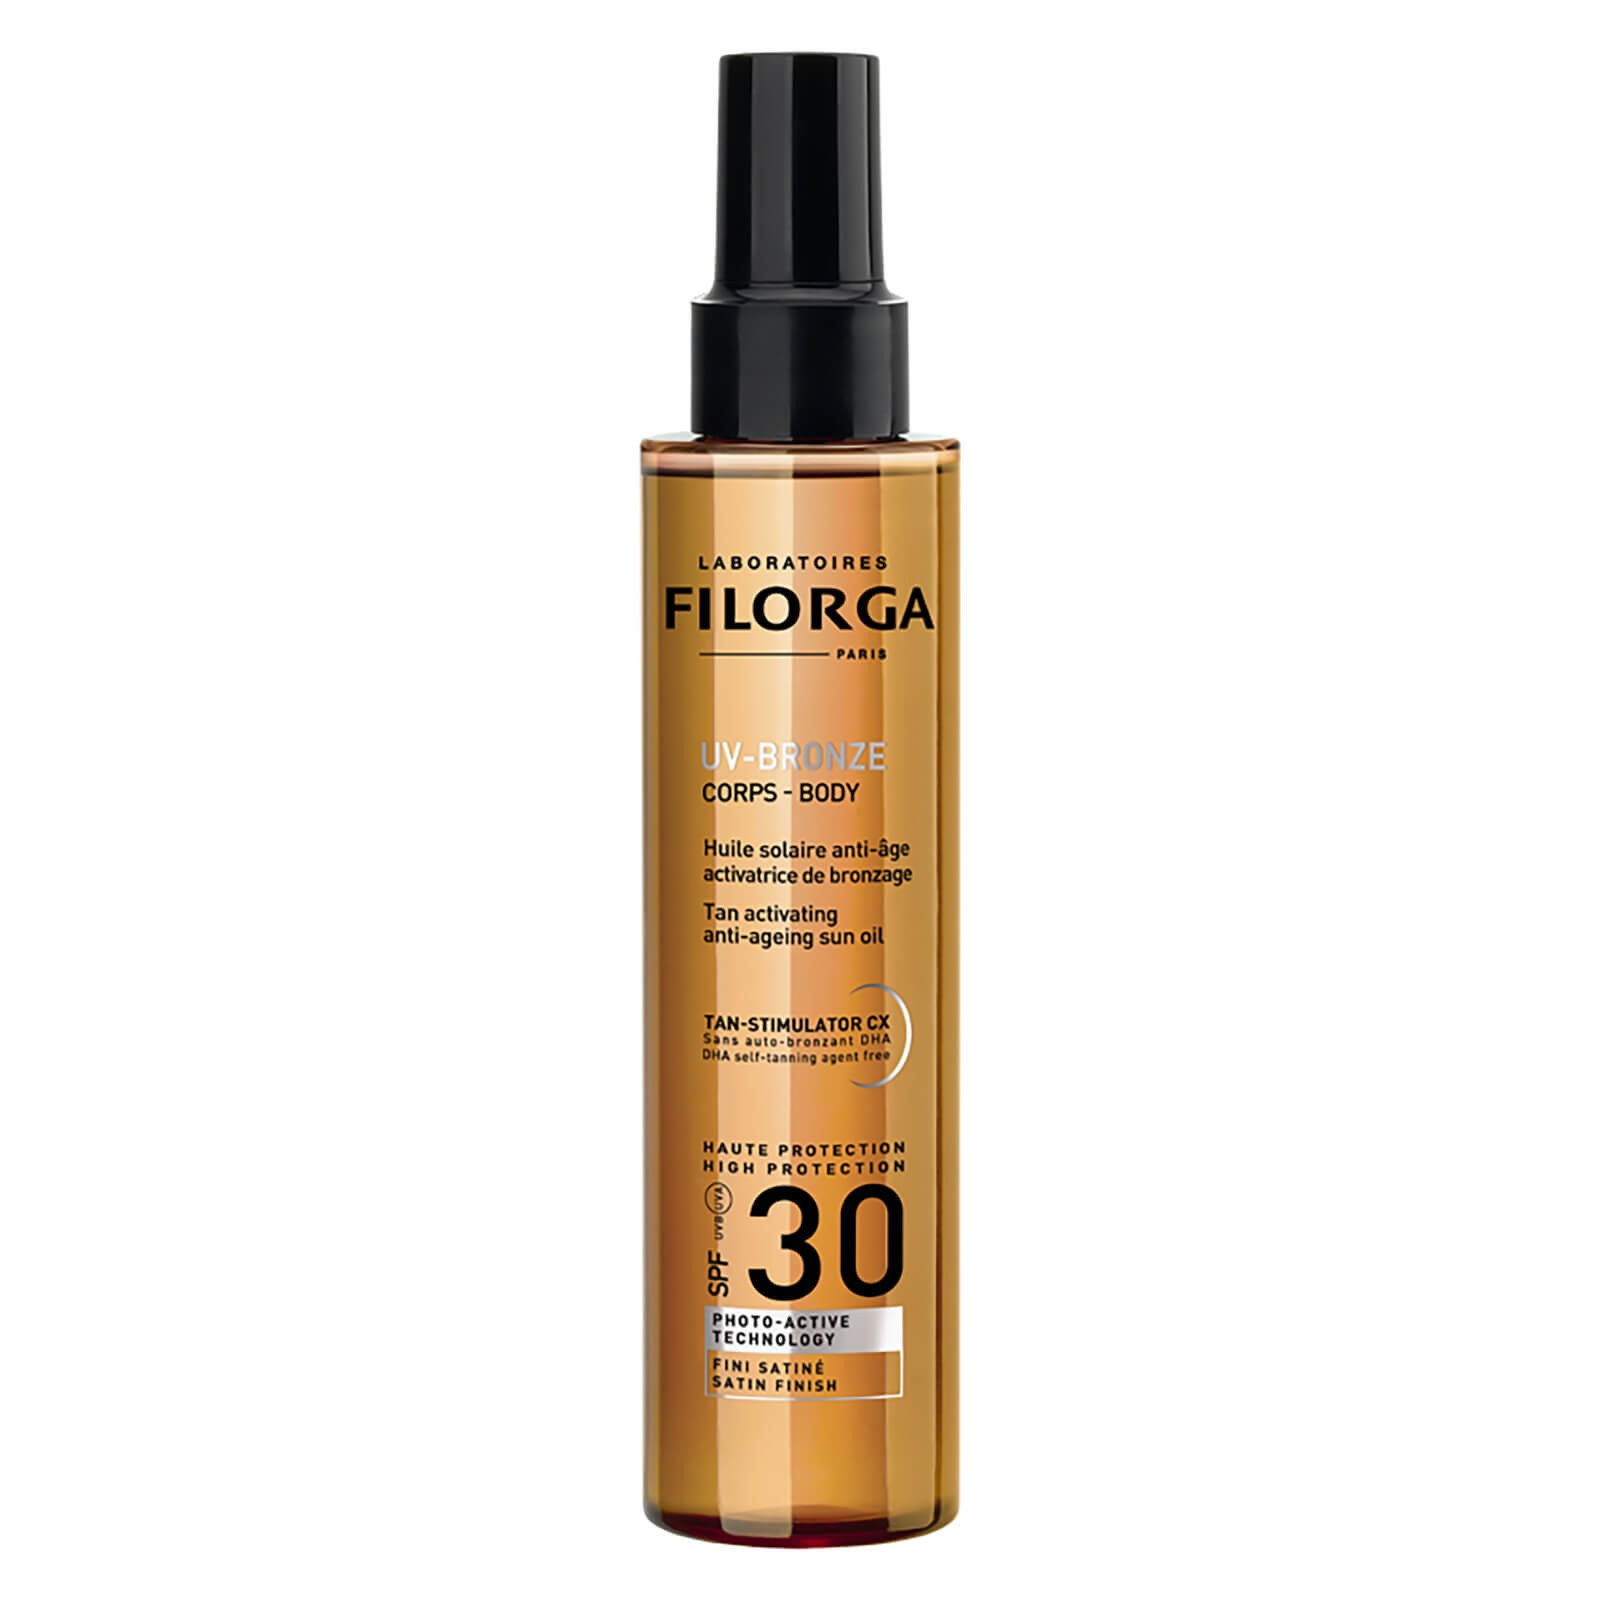 FILORGA 菲洛嘉 UV-BRONZE 抗衰老防曬身體油 SPF30 150ml